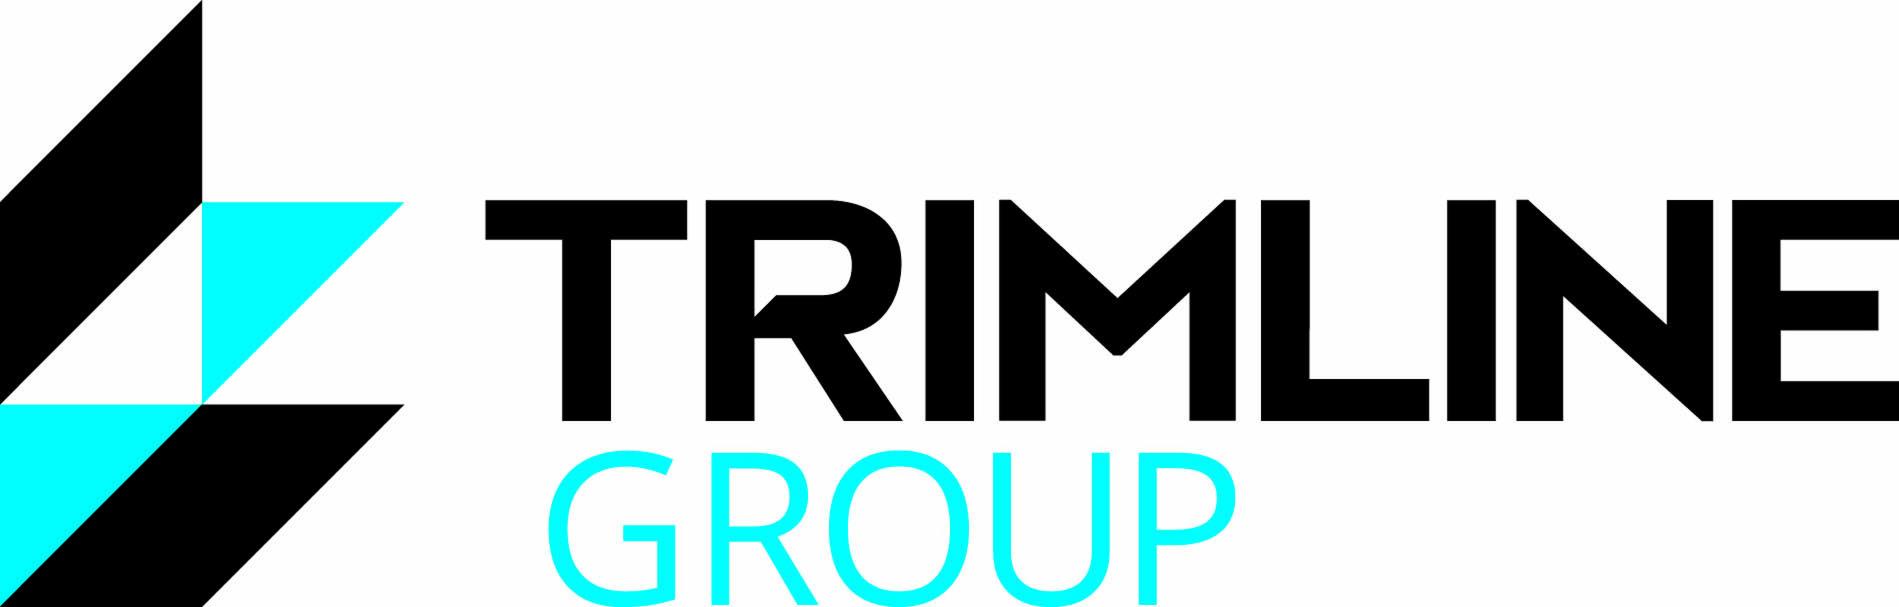 Trimline Group